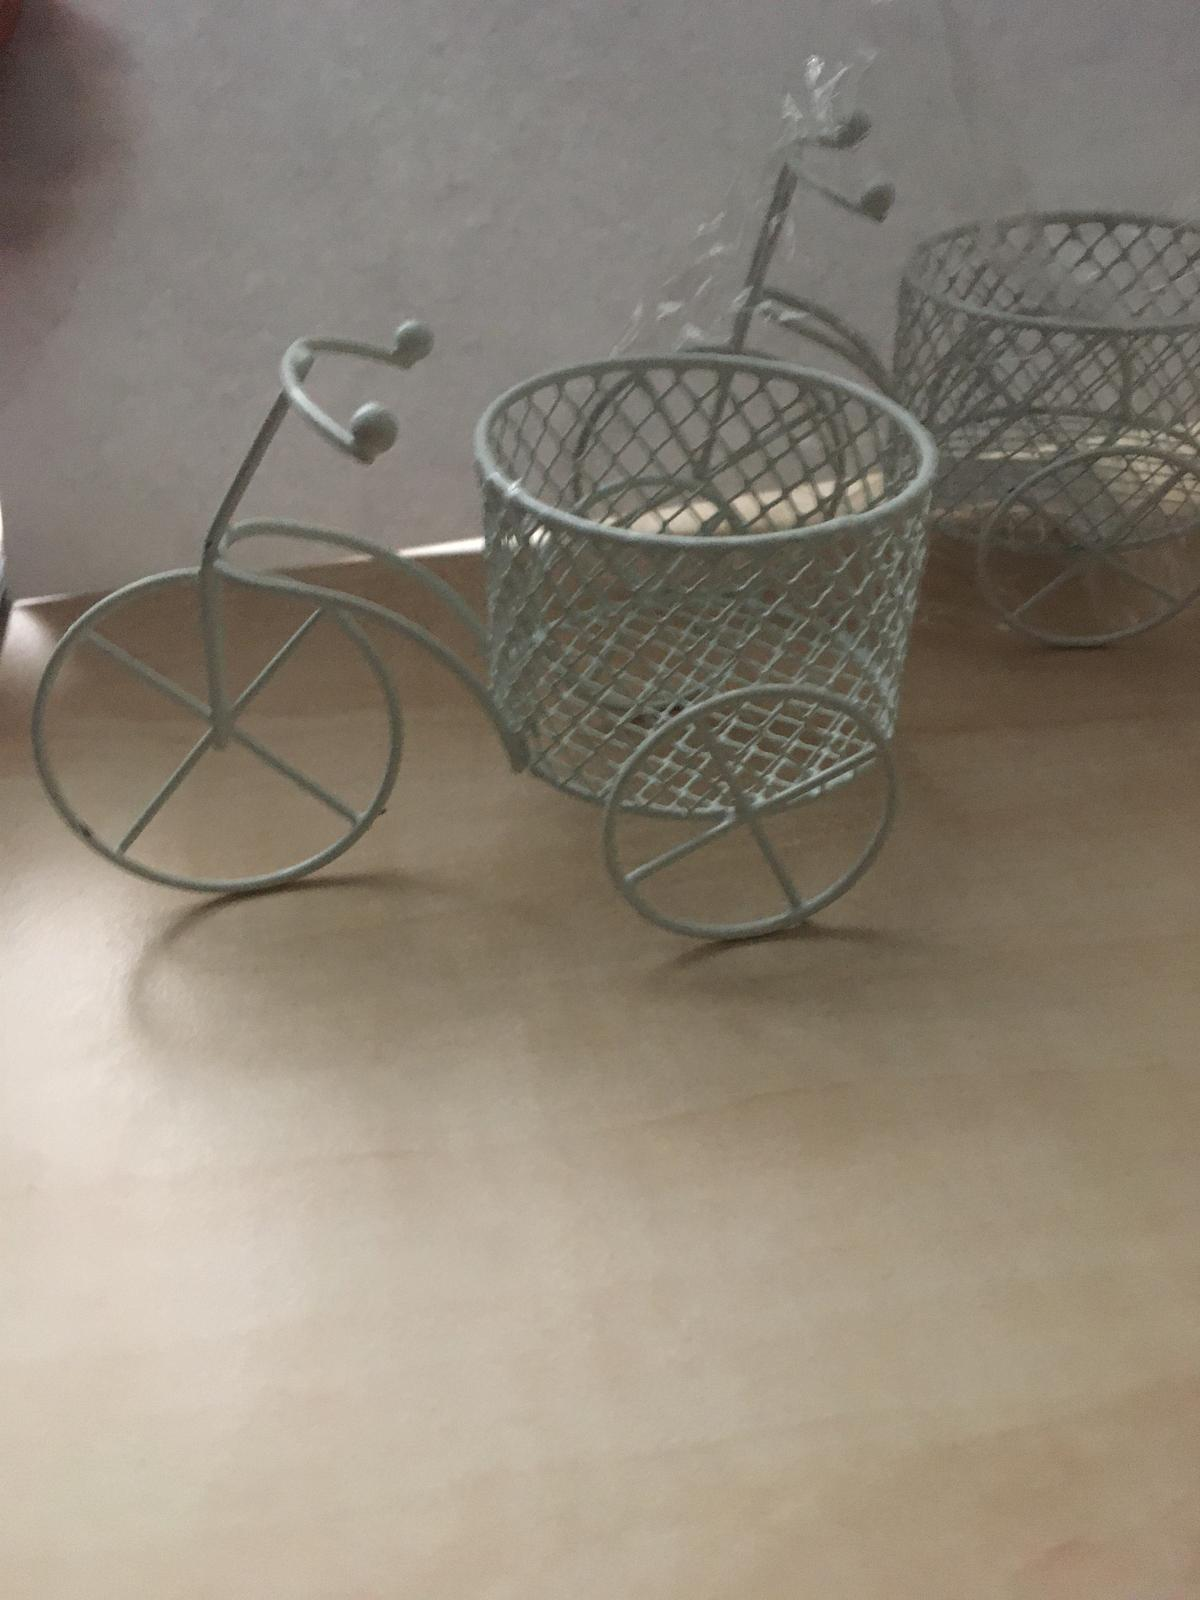 Stojany v tvare bike - Obrázok č. 1